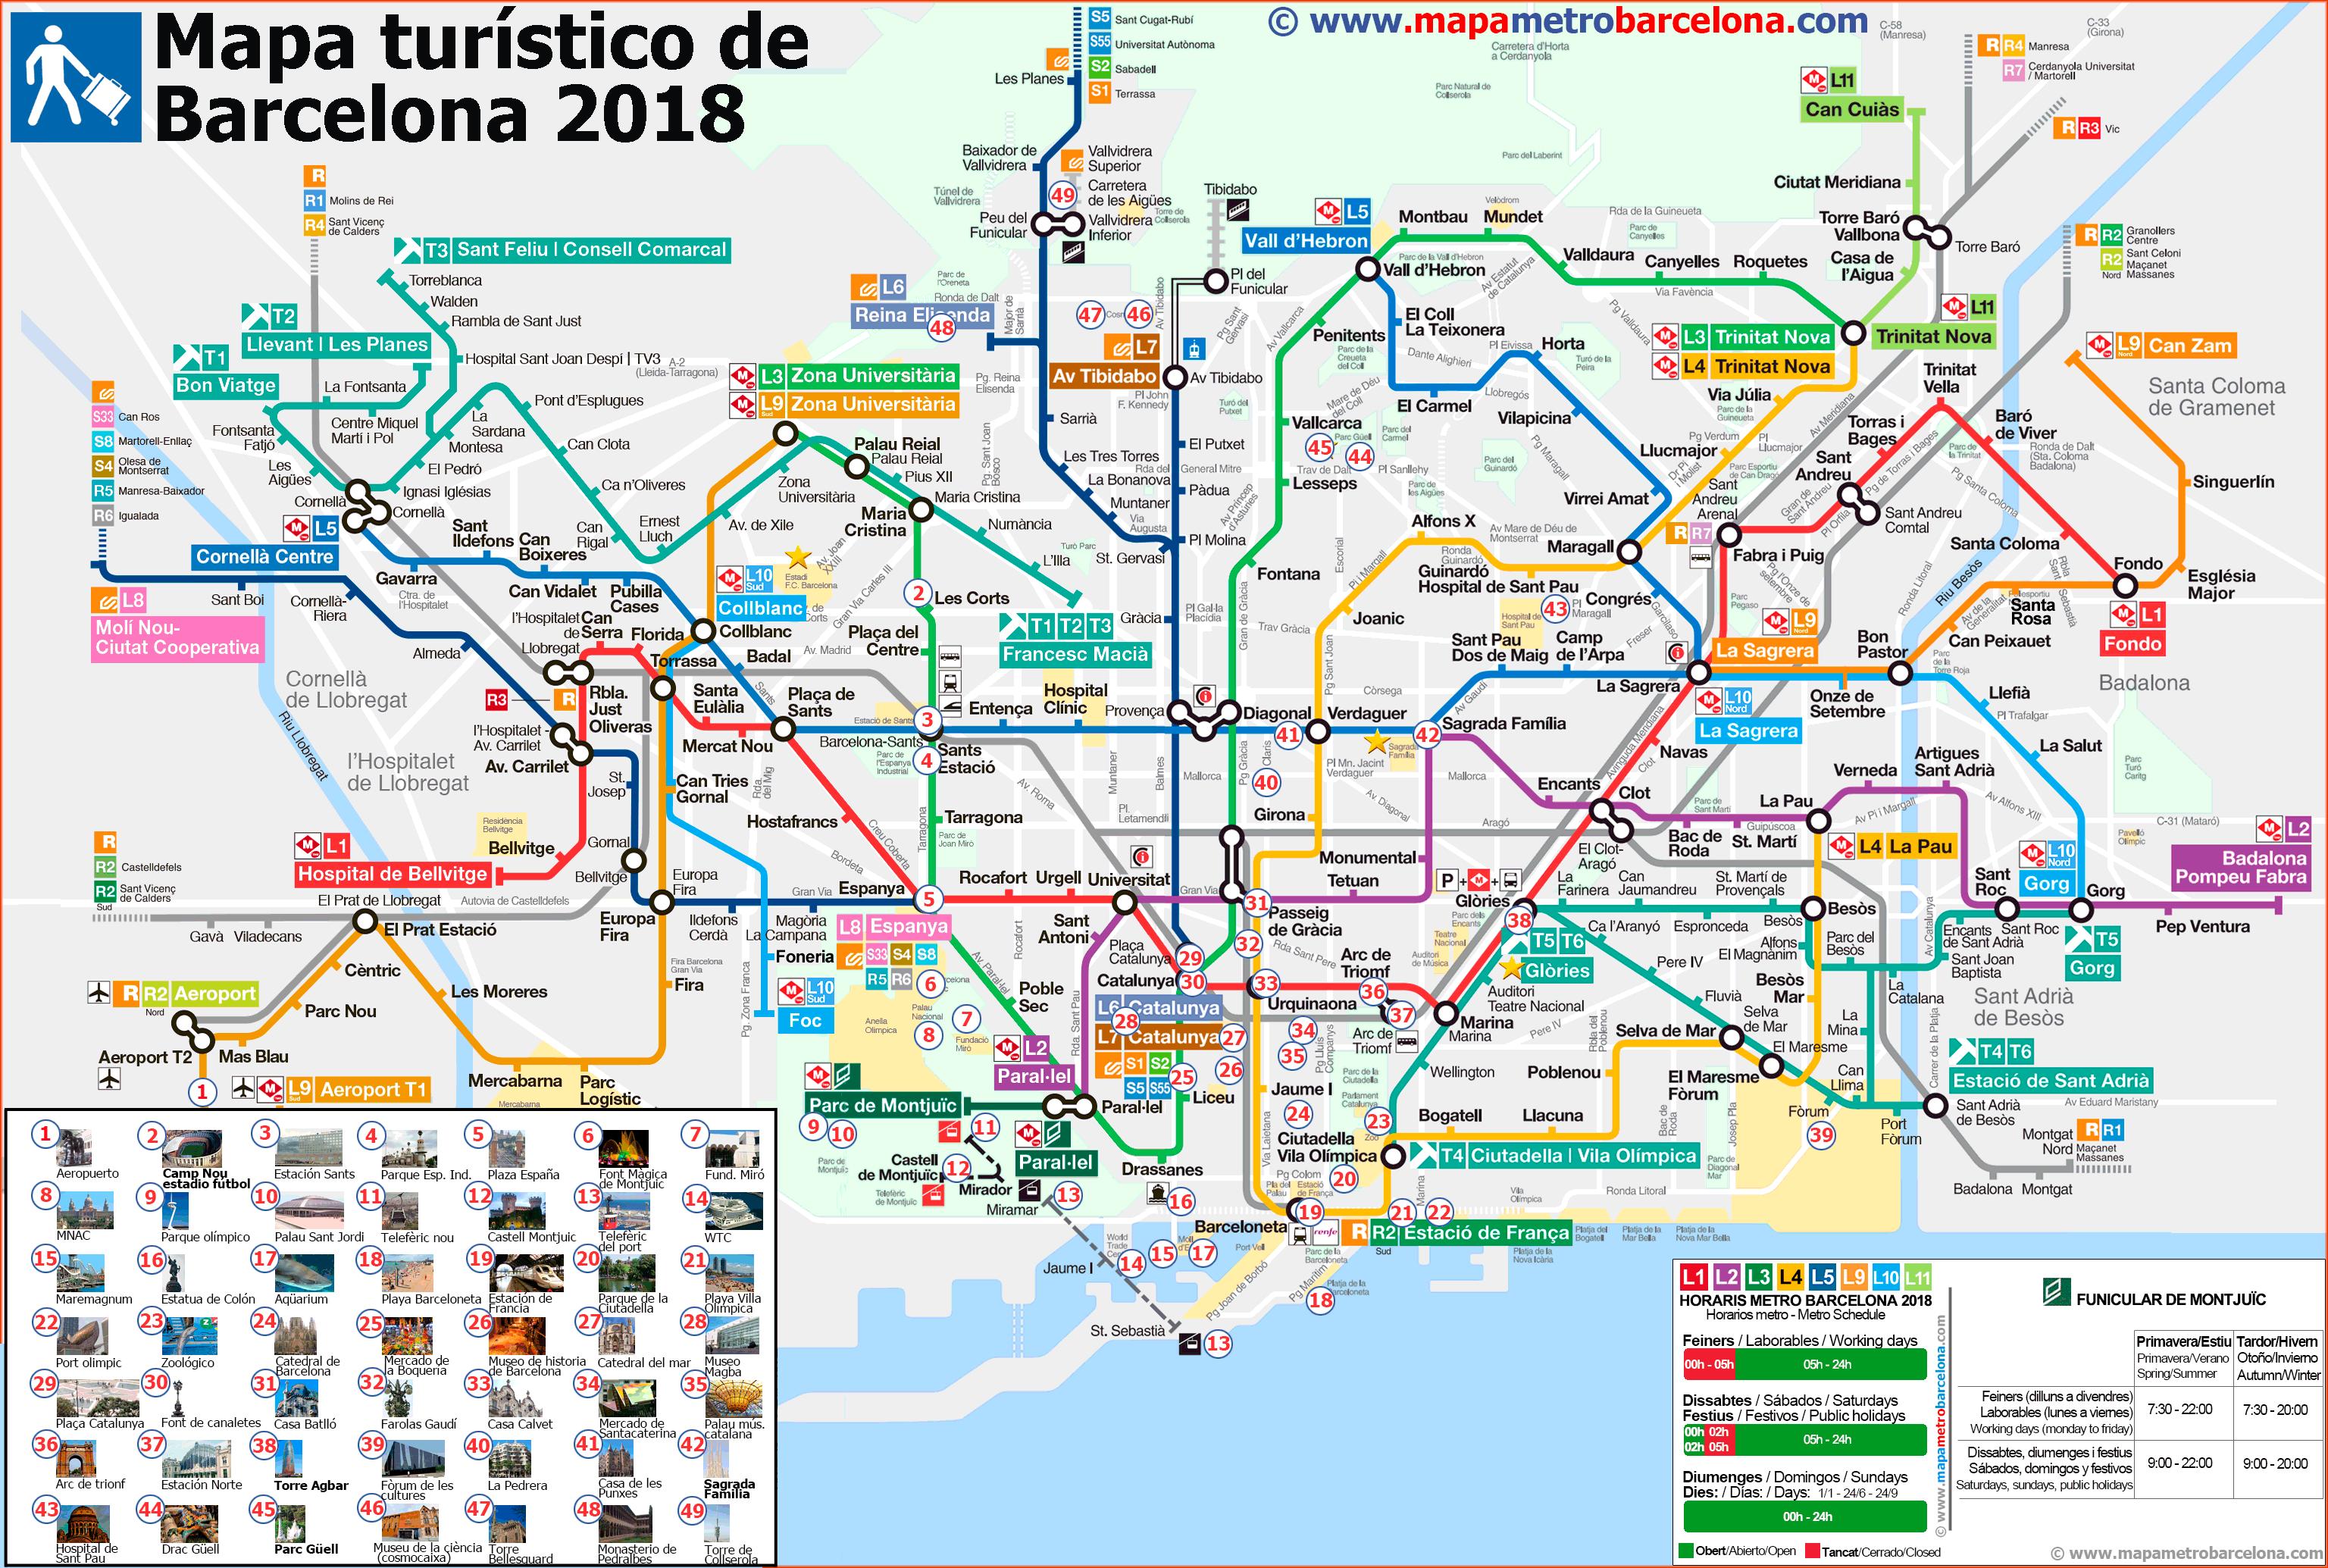 Карта метро Барселоны для туристов